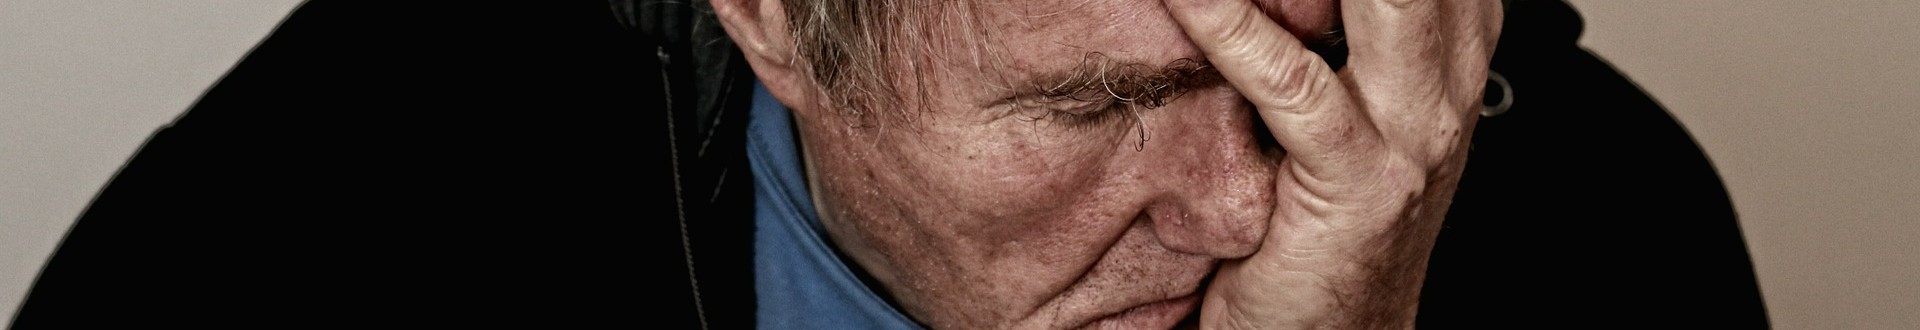 Renter leben in Armut